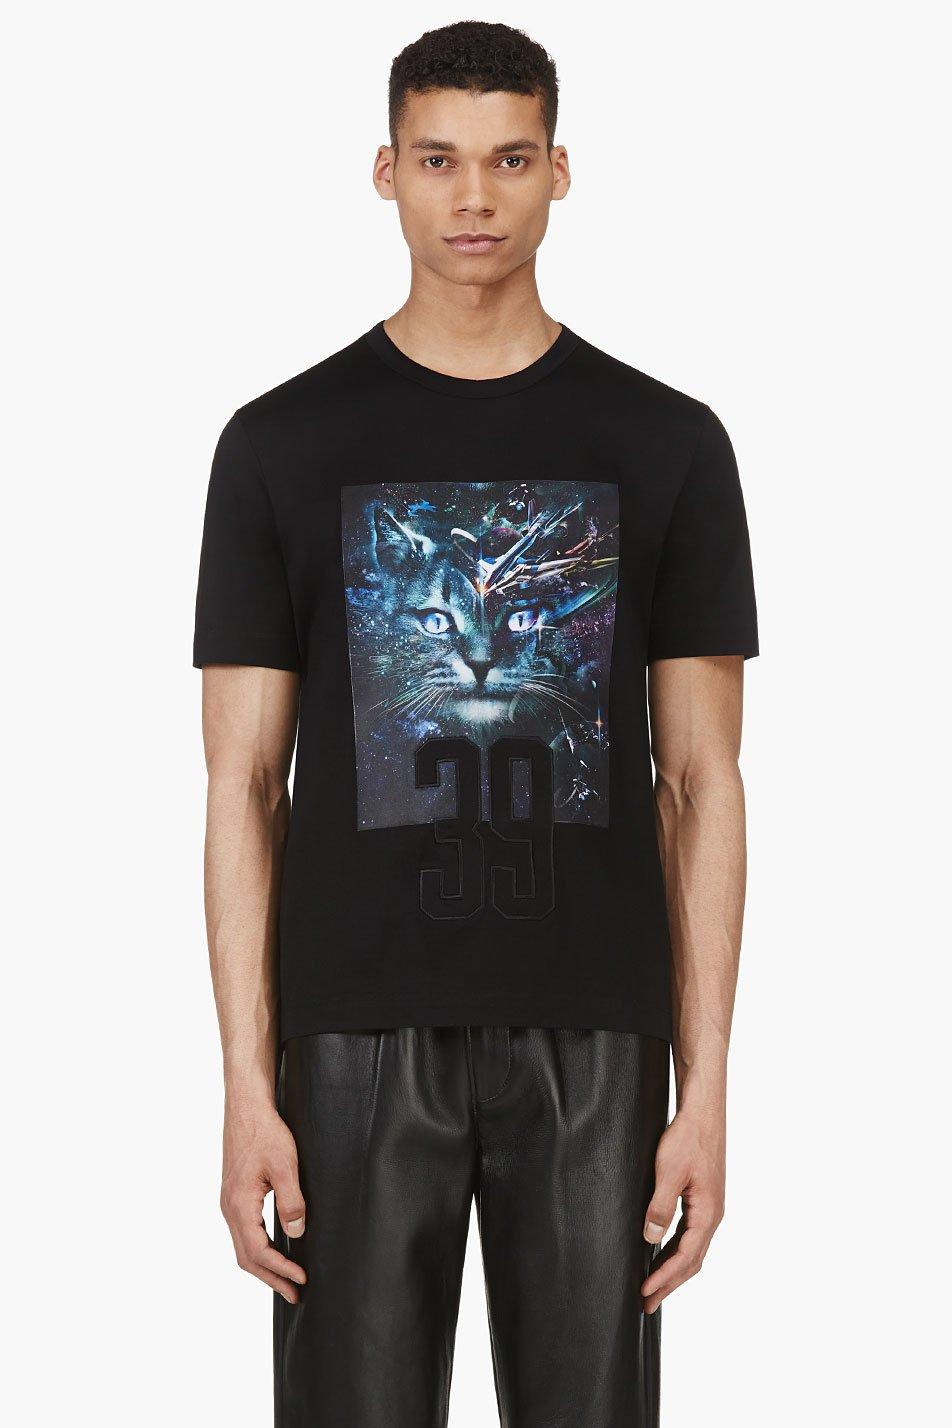 Juun.j ssense exclusive black and green cosmic cat t_shirt